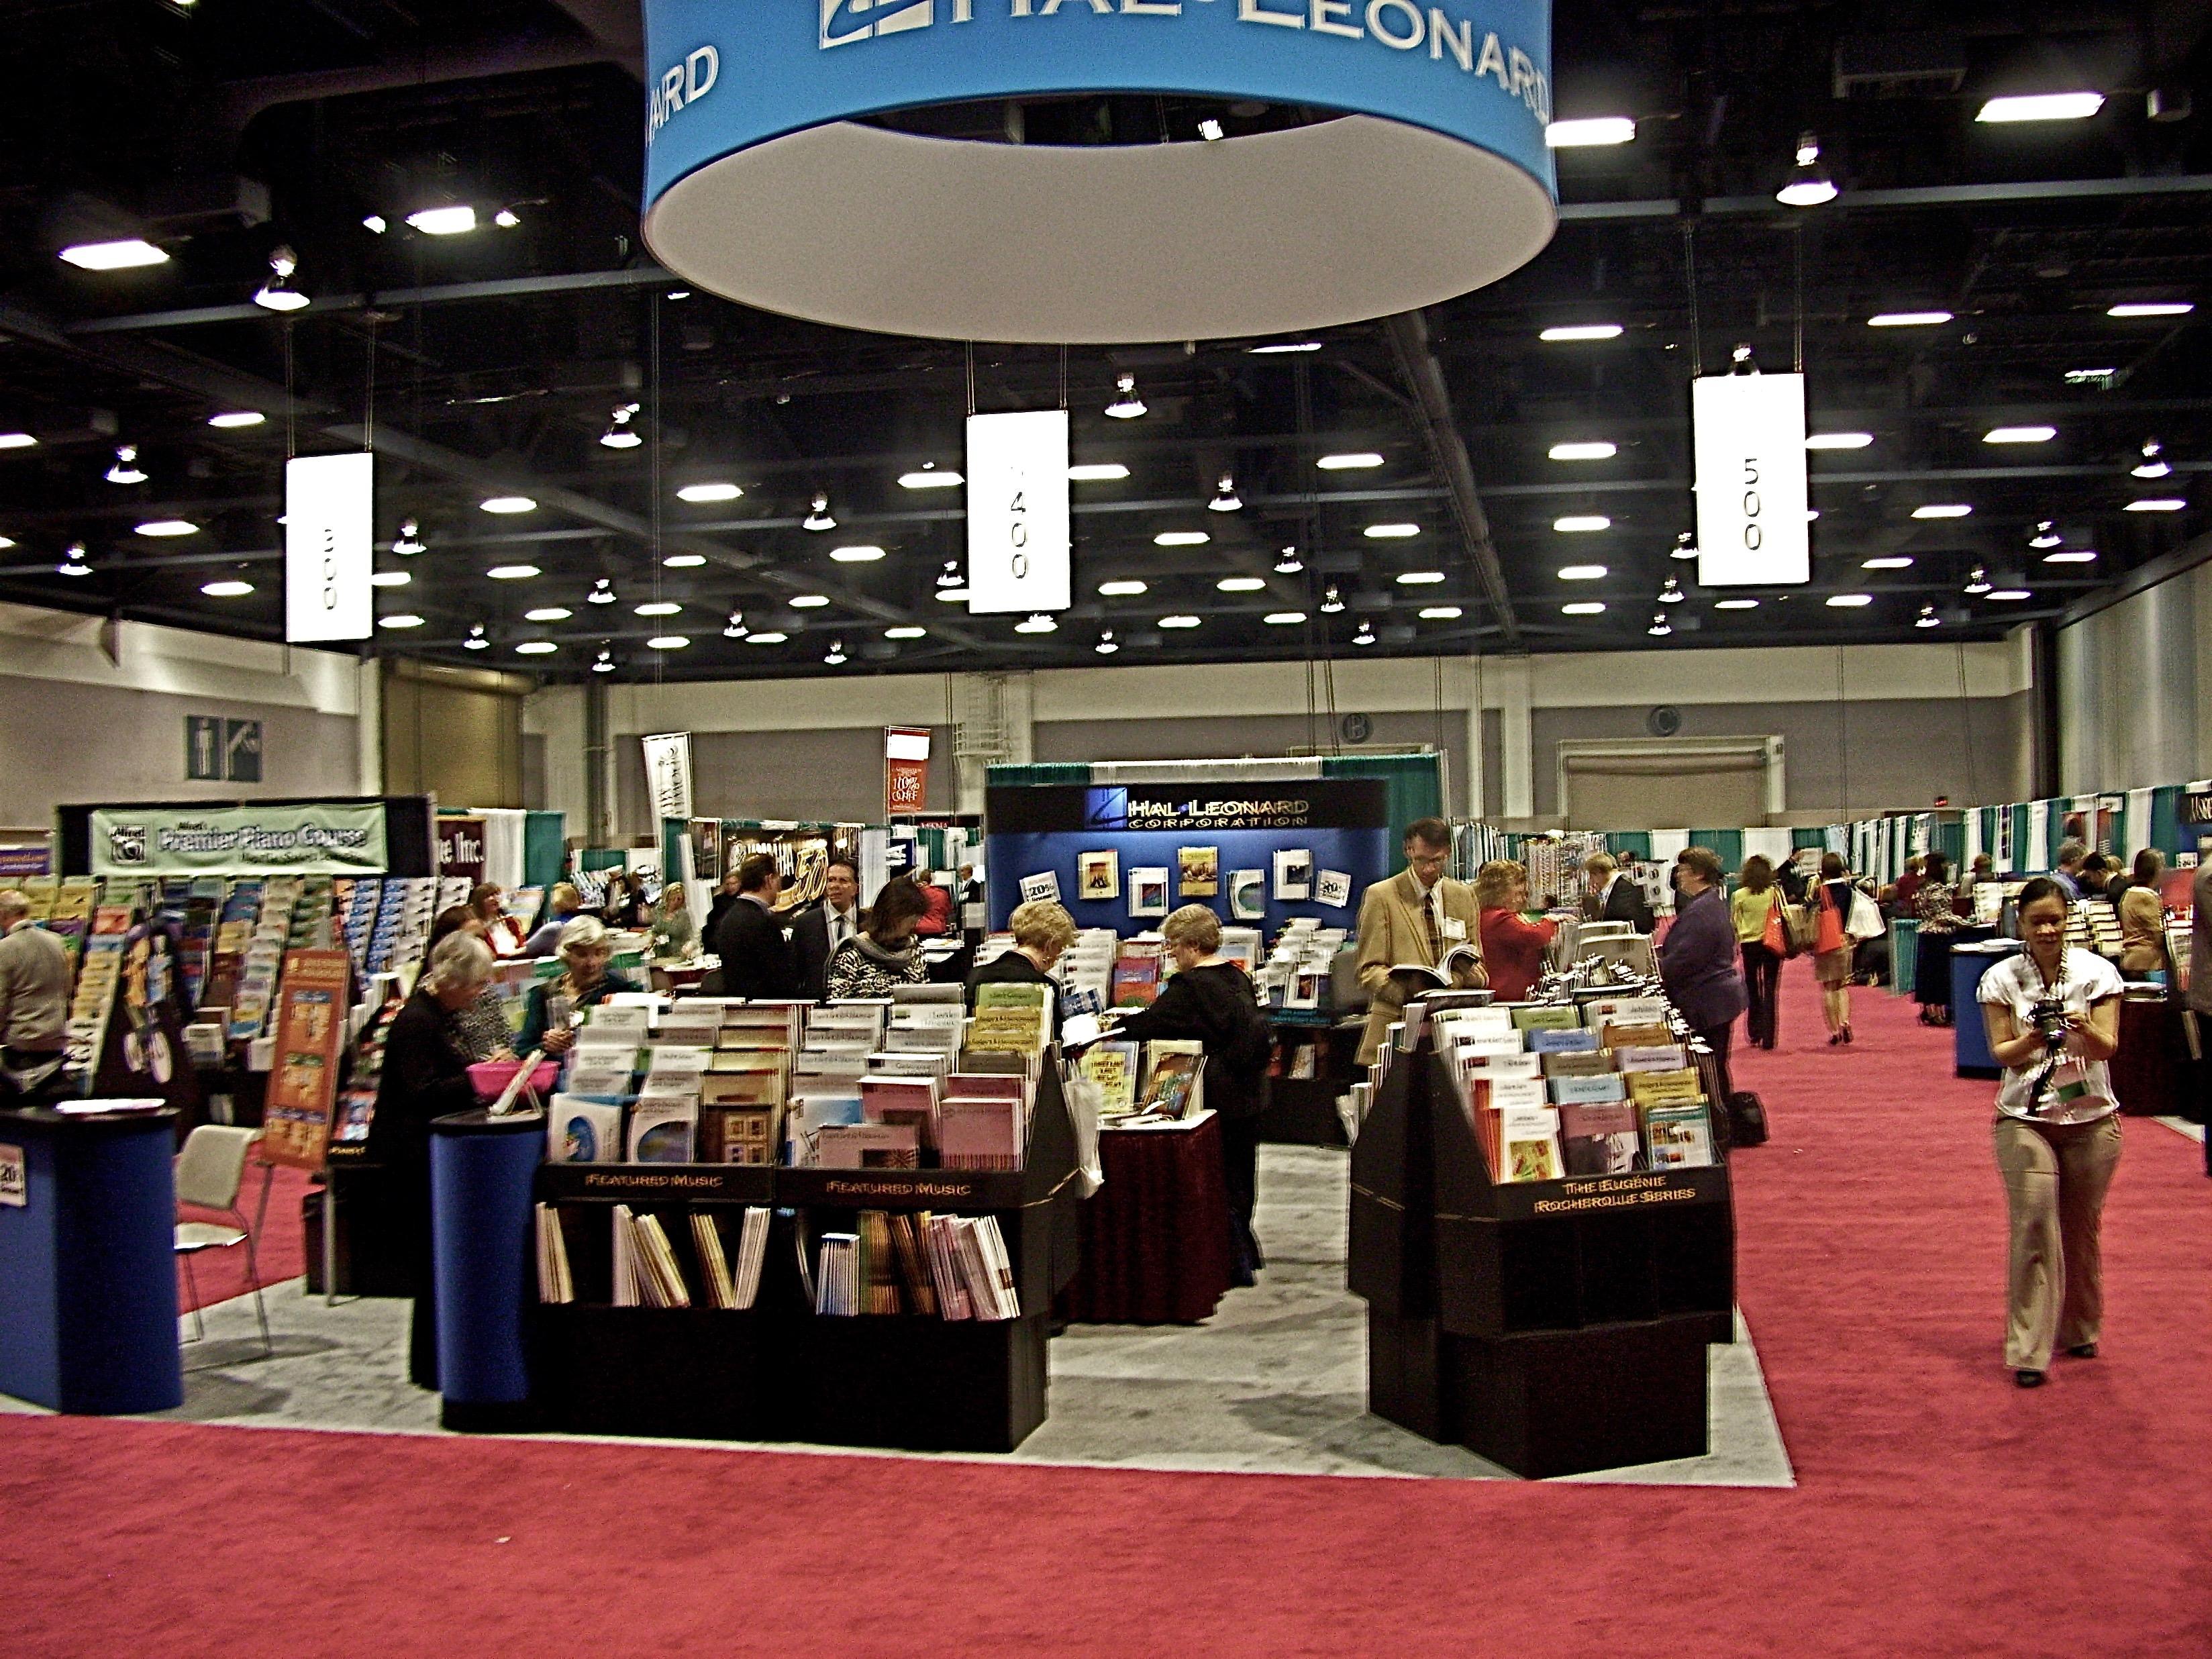 Hal Leonard booth at MTNA Milwaukee